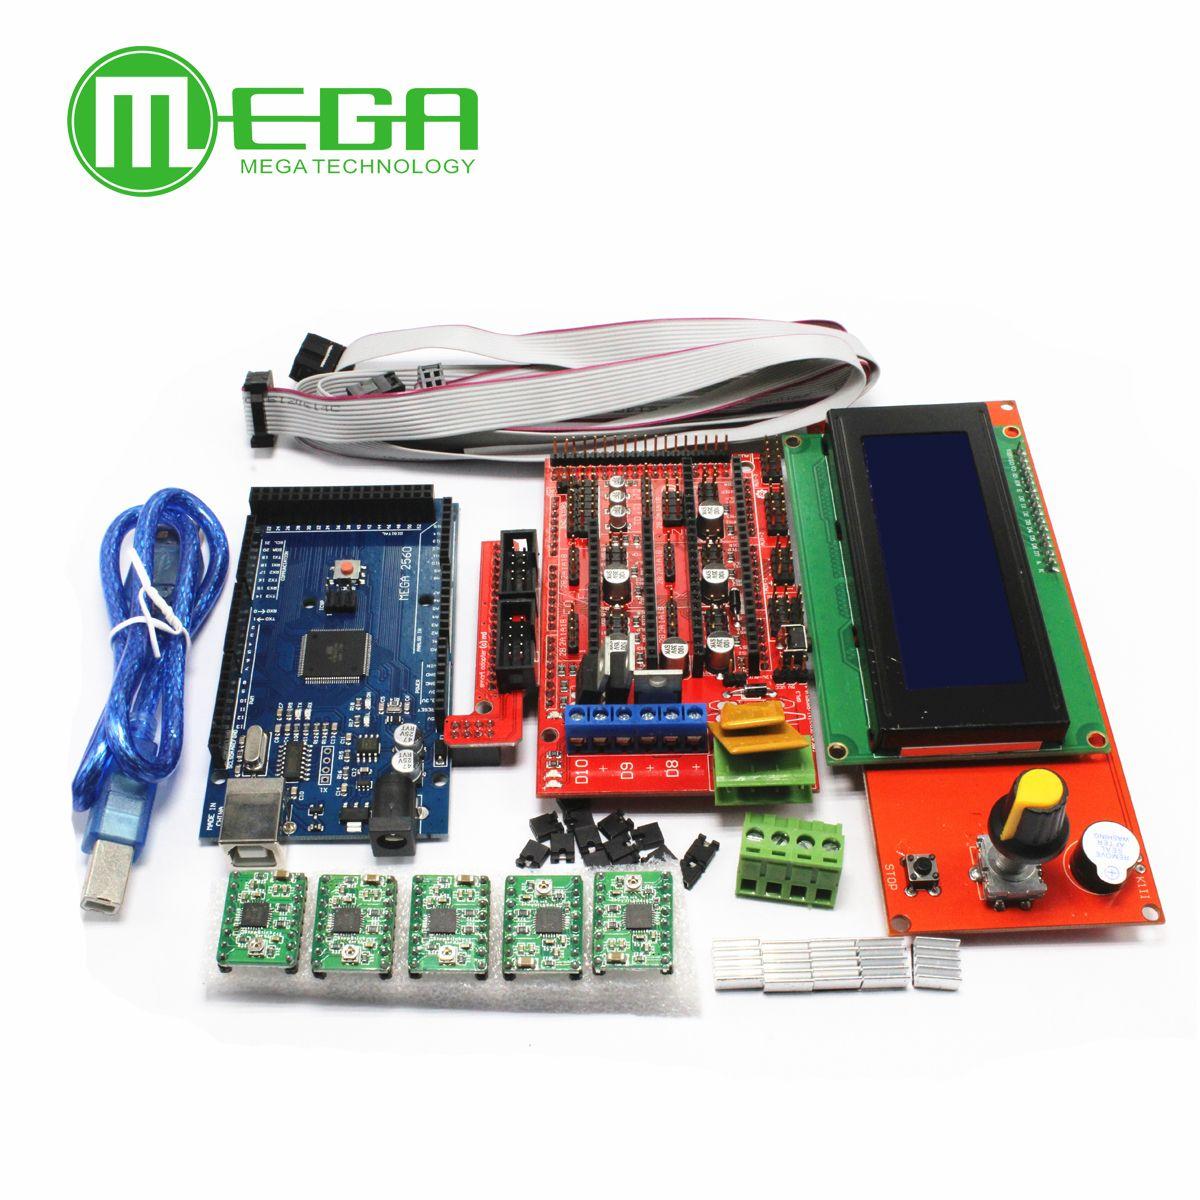 3D Printer Kit Mega 2560 R3 + 1Pcs RAMPS 1.4 Controller + 5Pcs A4988 Stepper Driver Module / RAMPS 1.4 2004 LCD Control